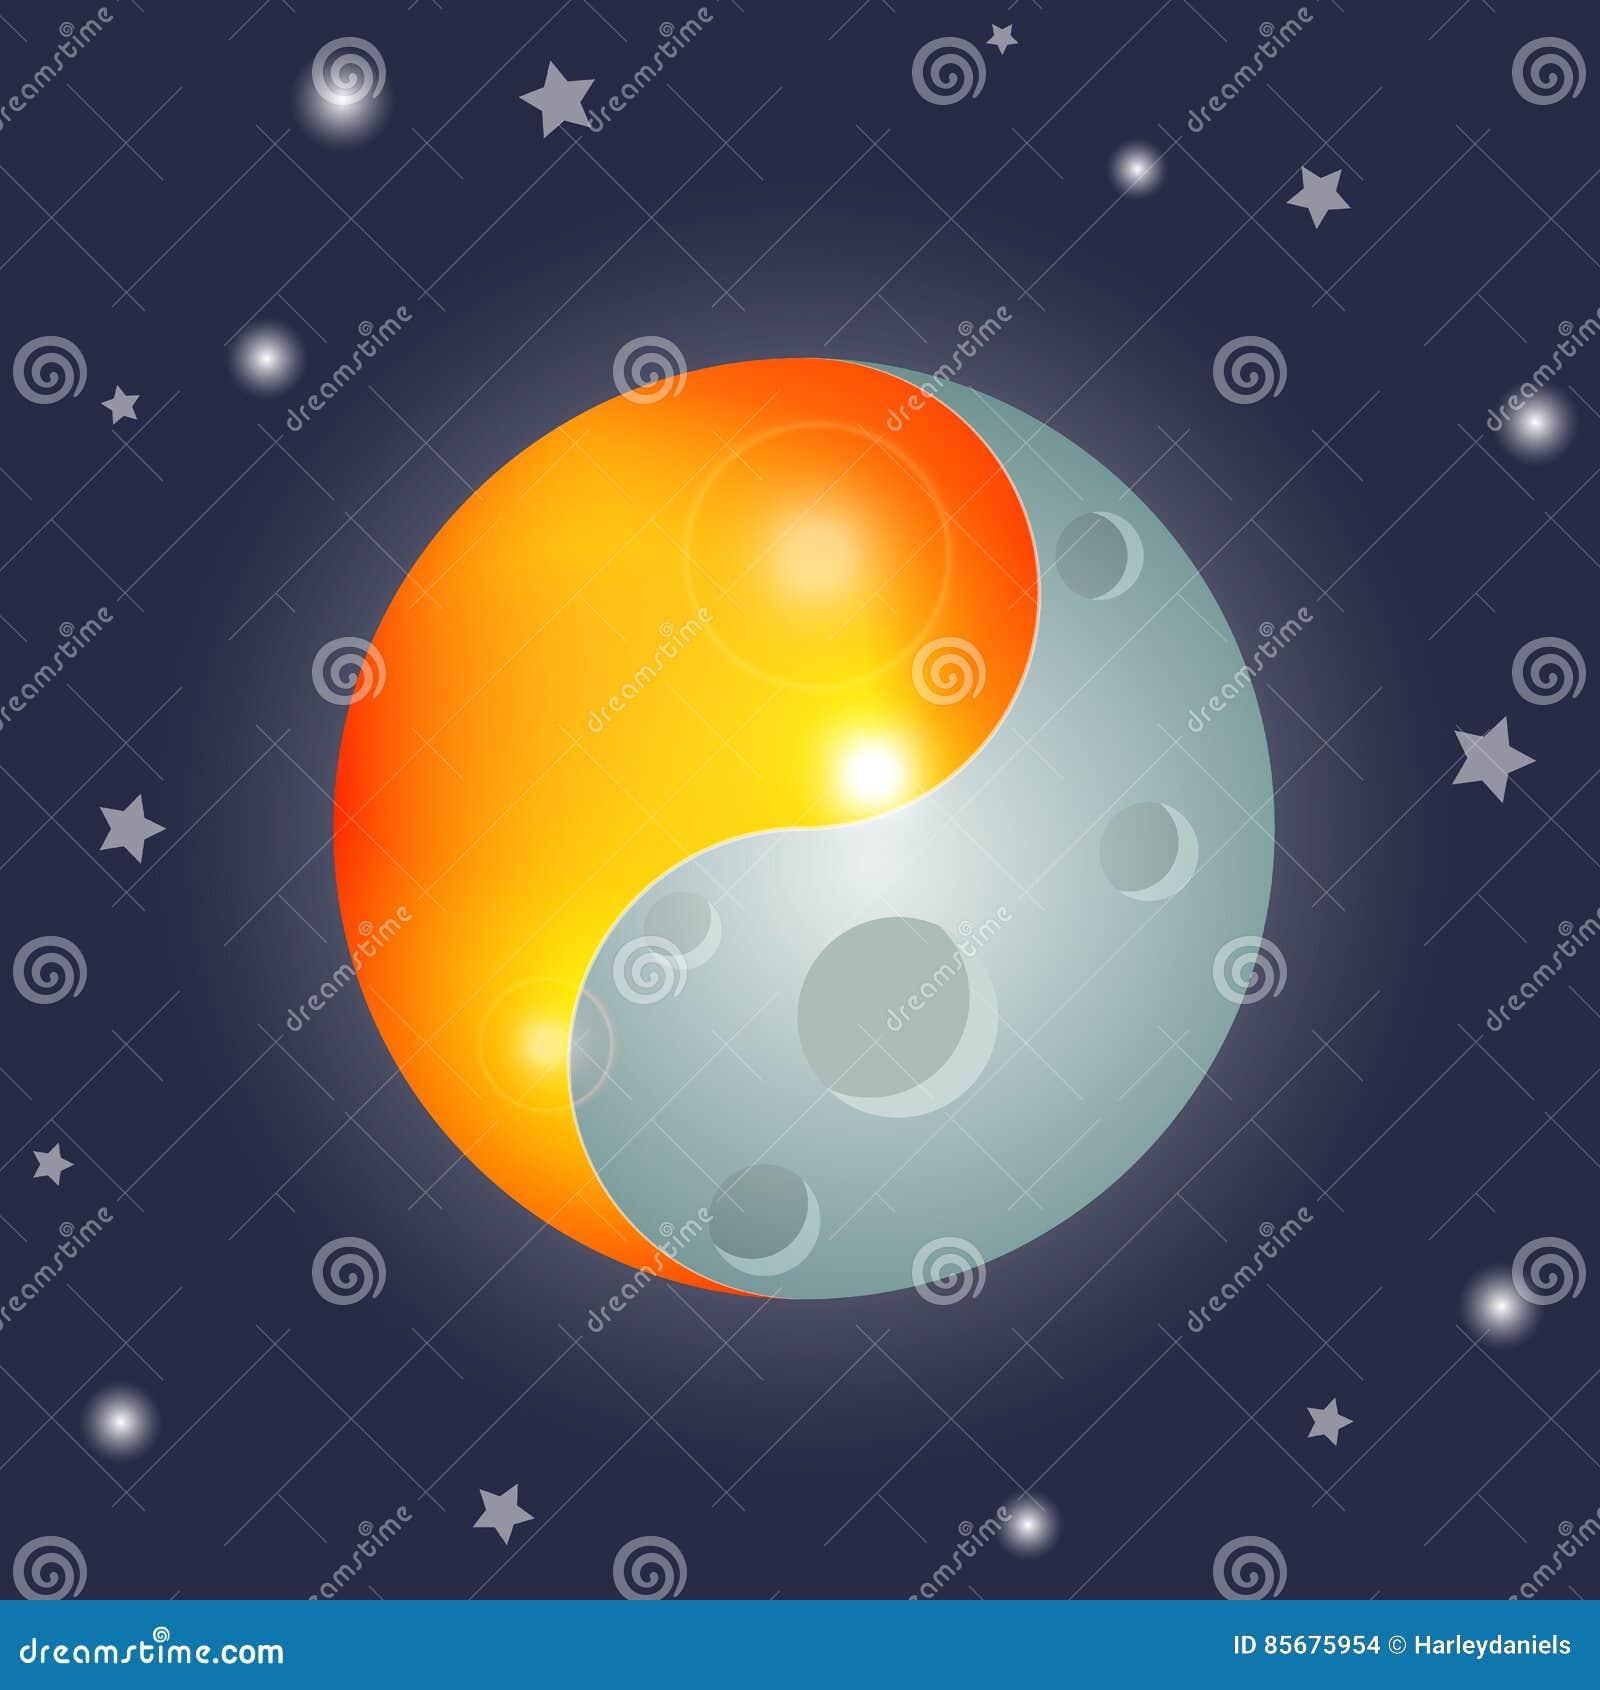 Yin And Yang Sun And Moon Equinox Stock Vector Illustration Of